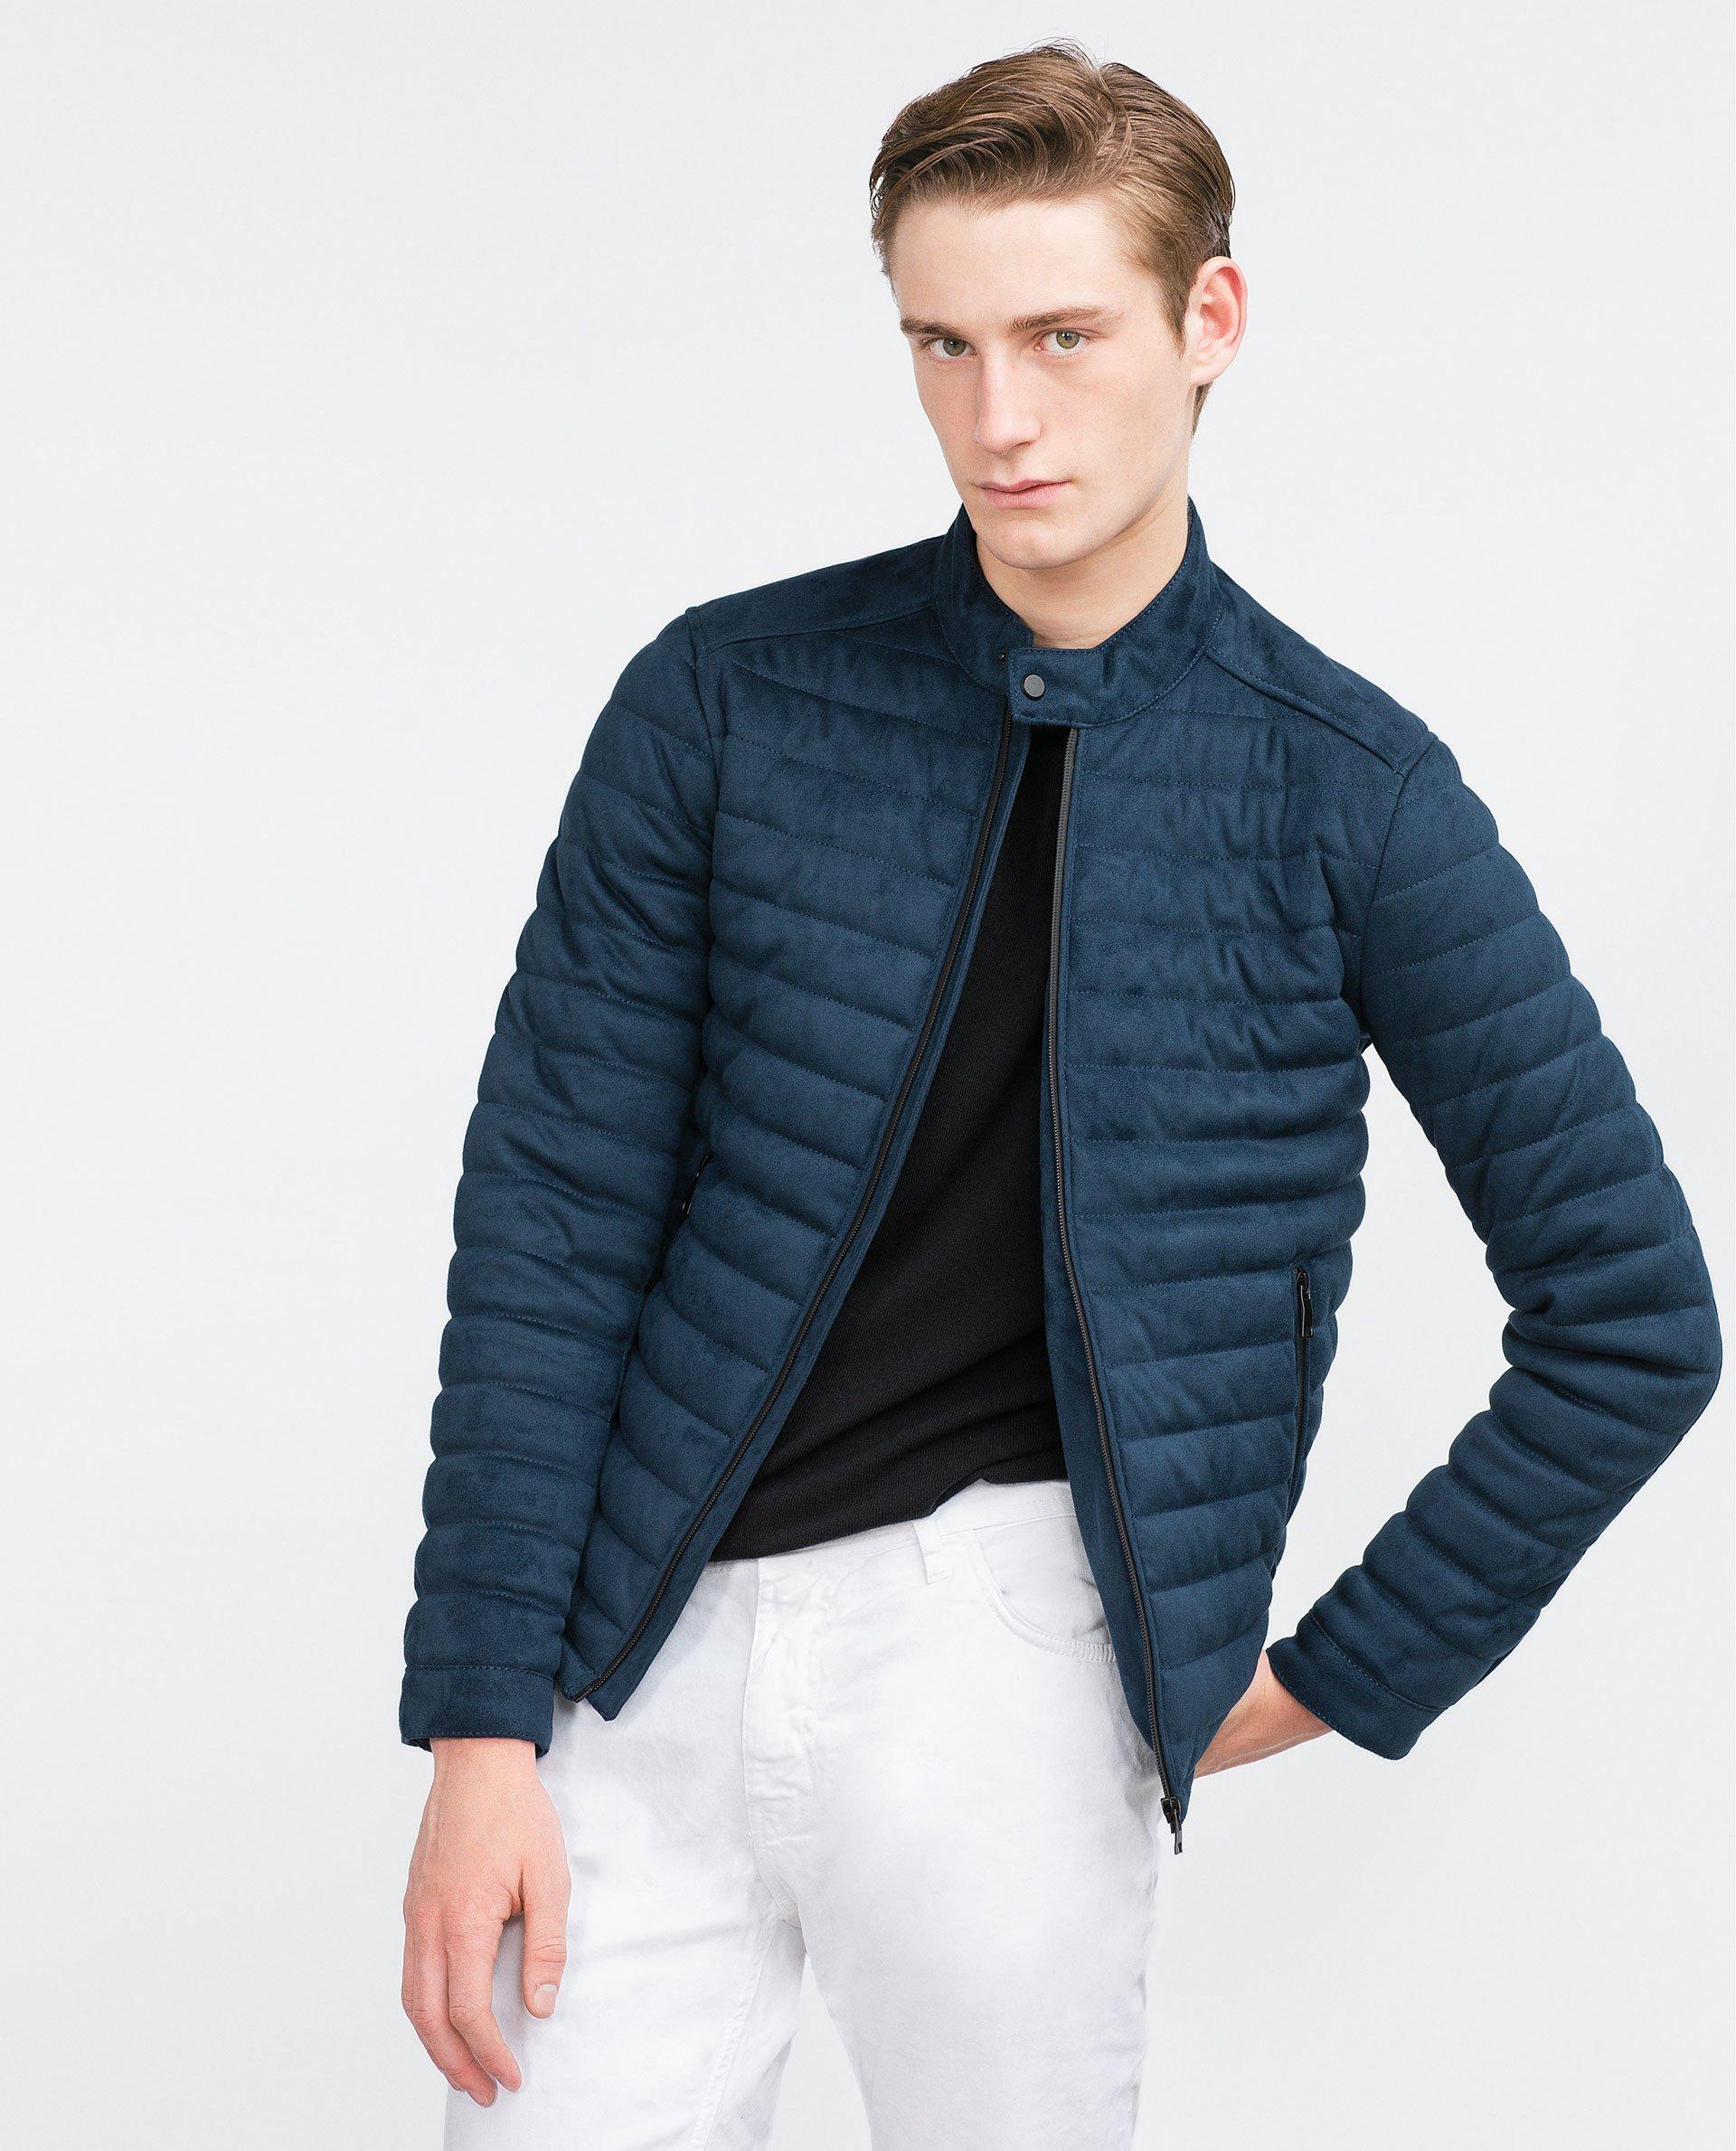 Authentic Authentic Faux Man Man Back Bnwt Jacket Leather Zara Black